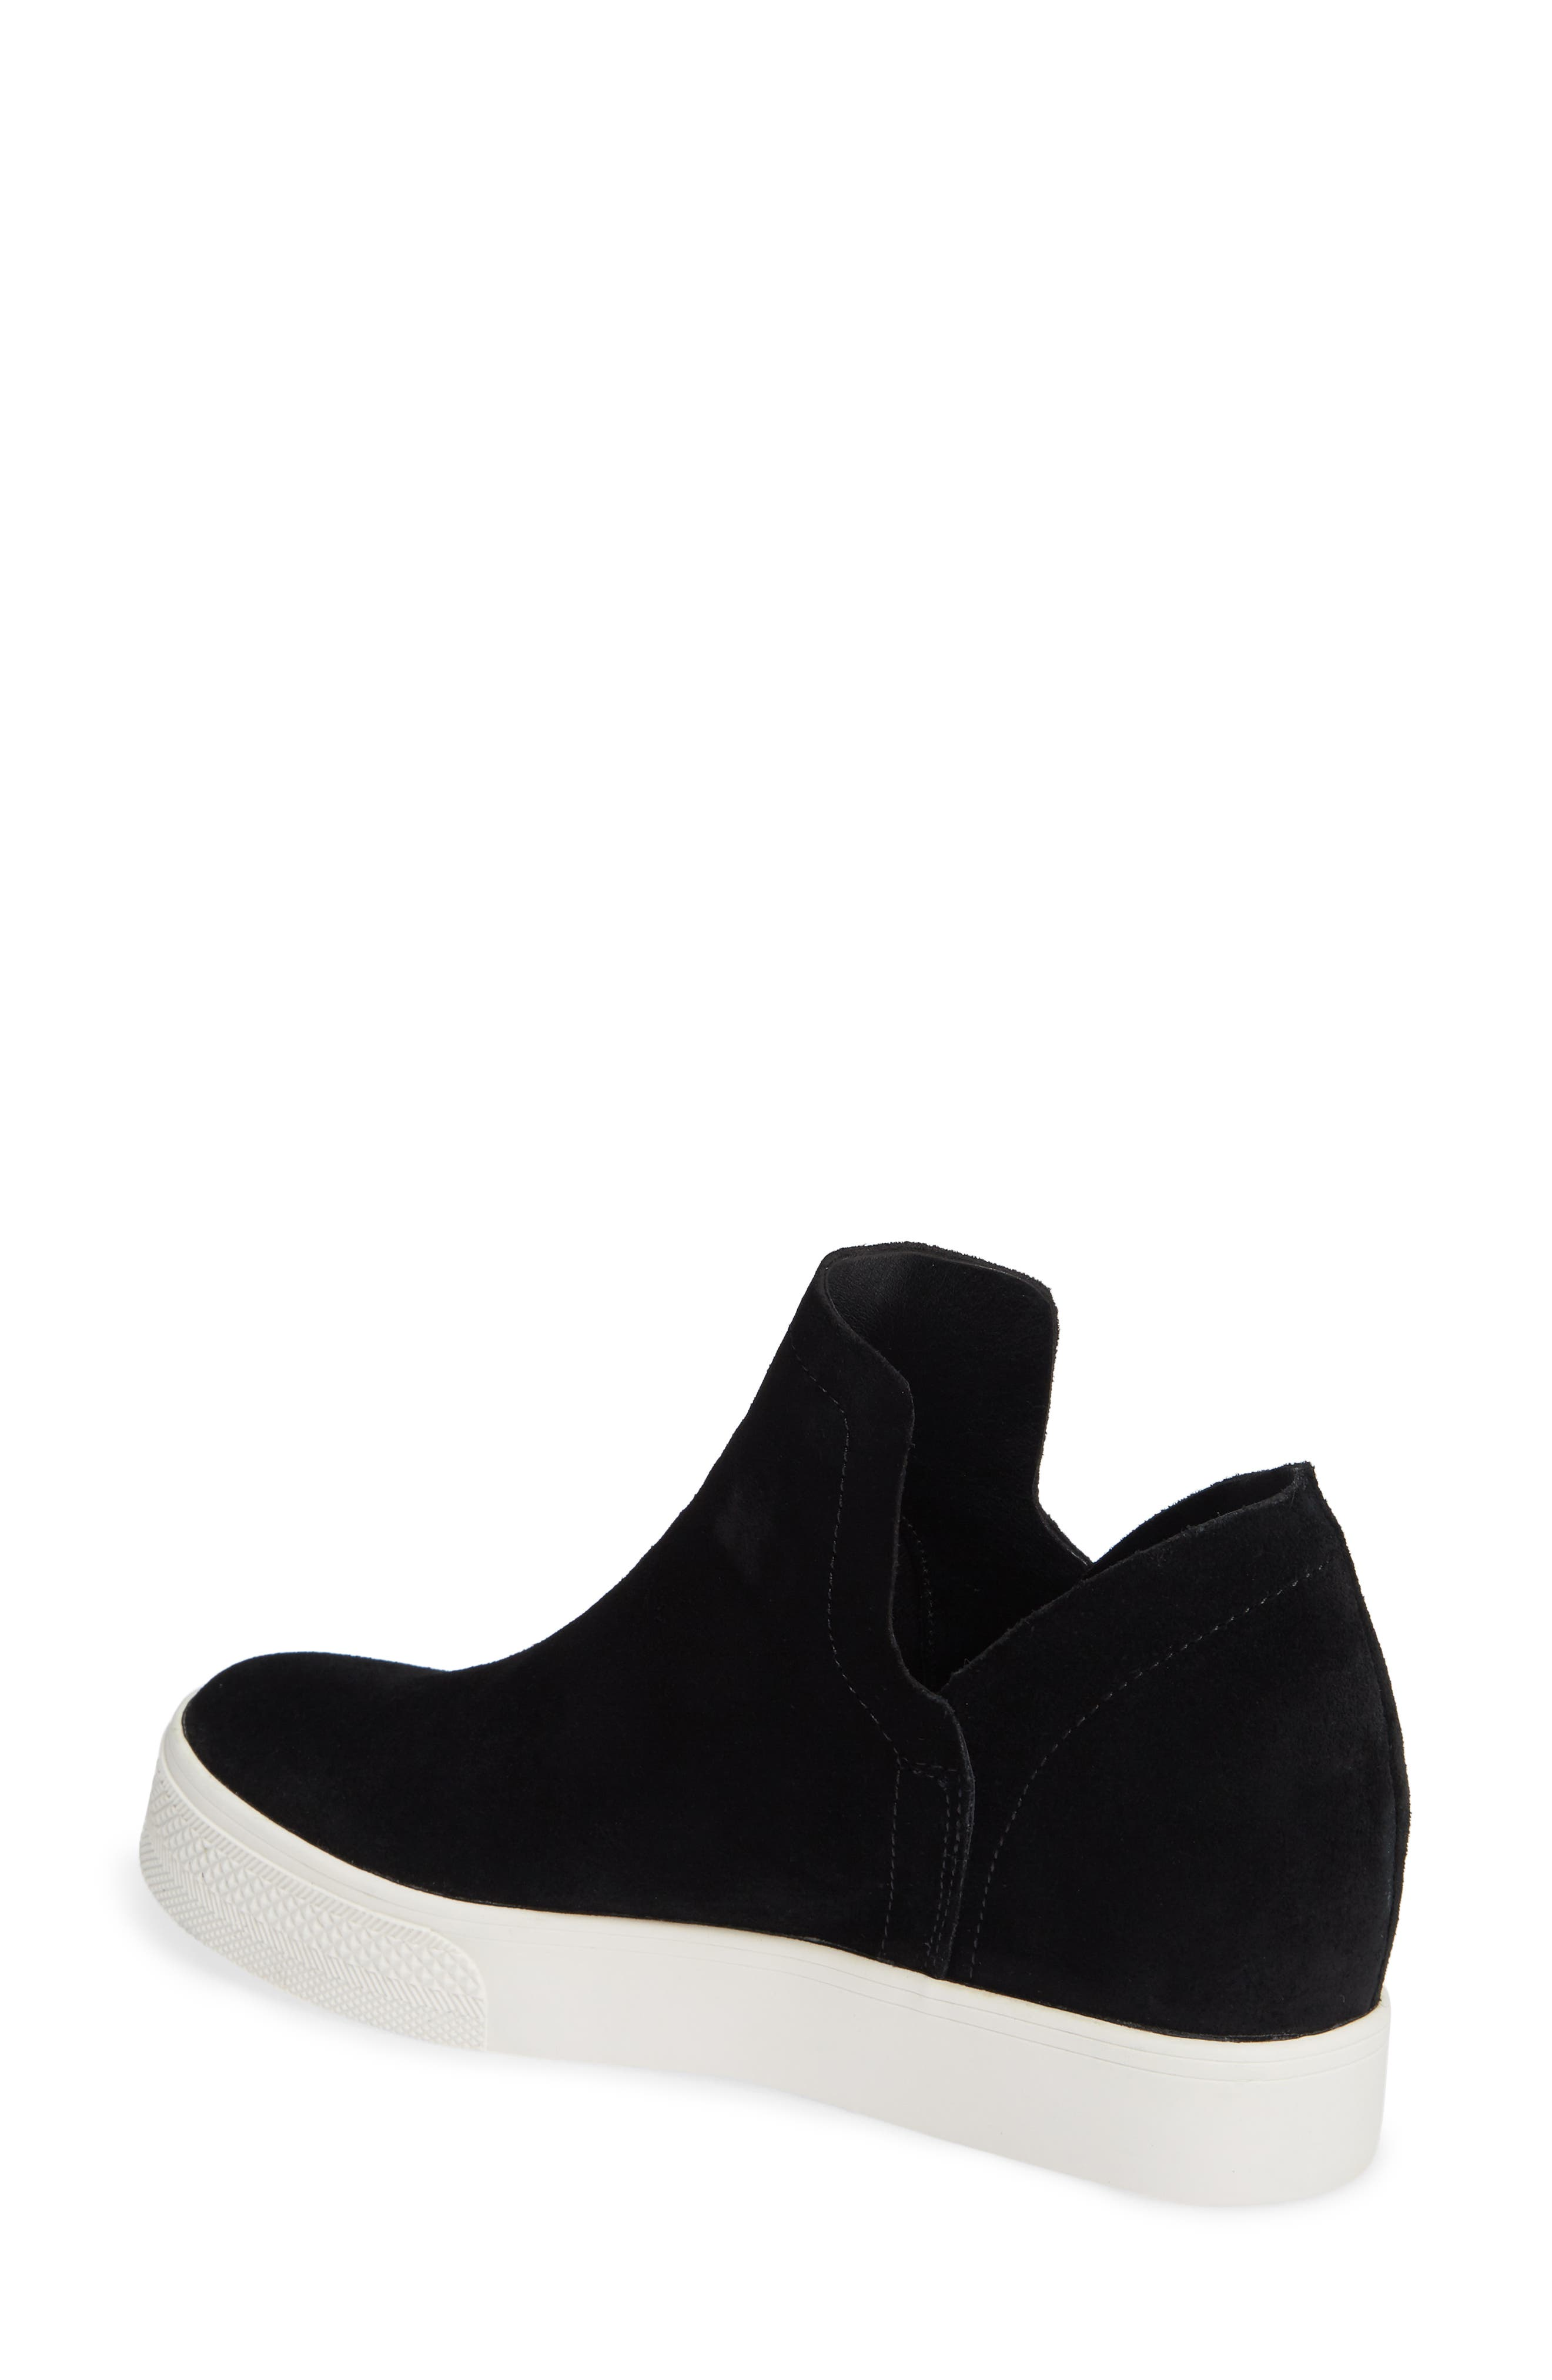 Wrangle Sneaker,                             Alternate thumbnail 2, color,                             BLACK SUEDE